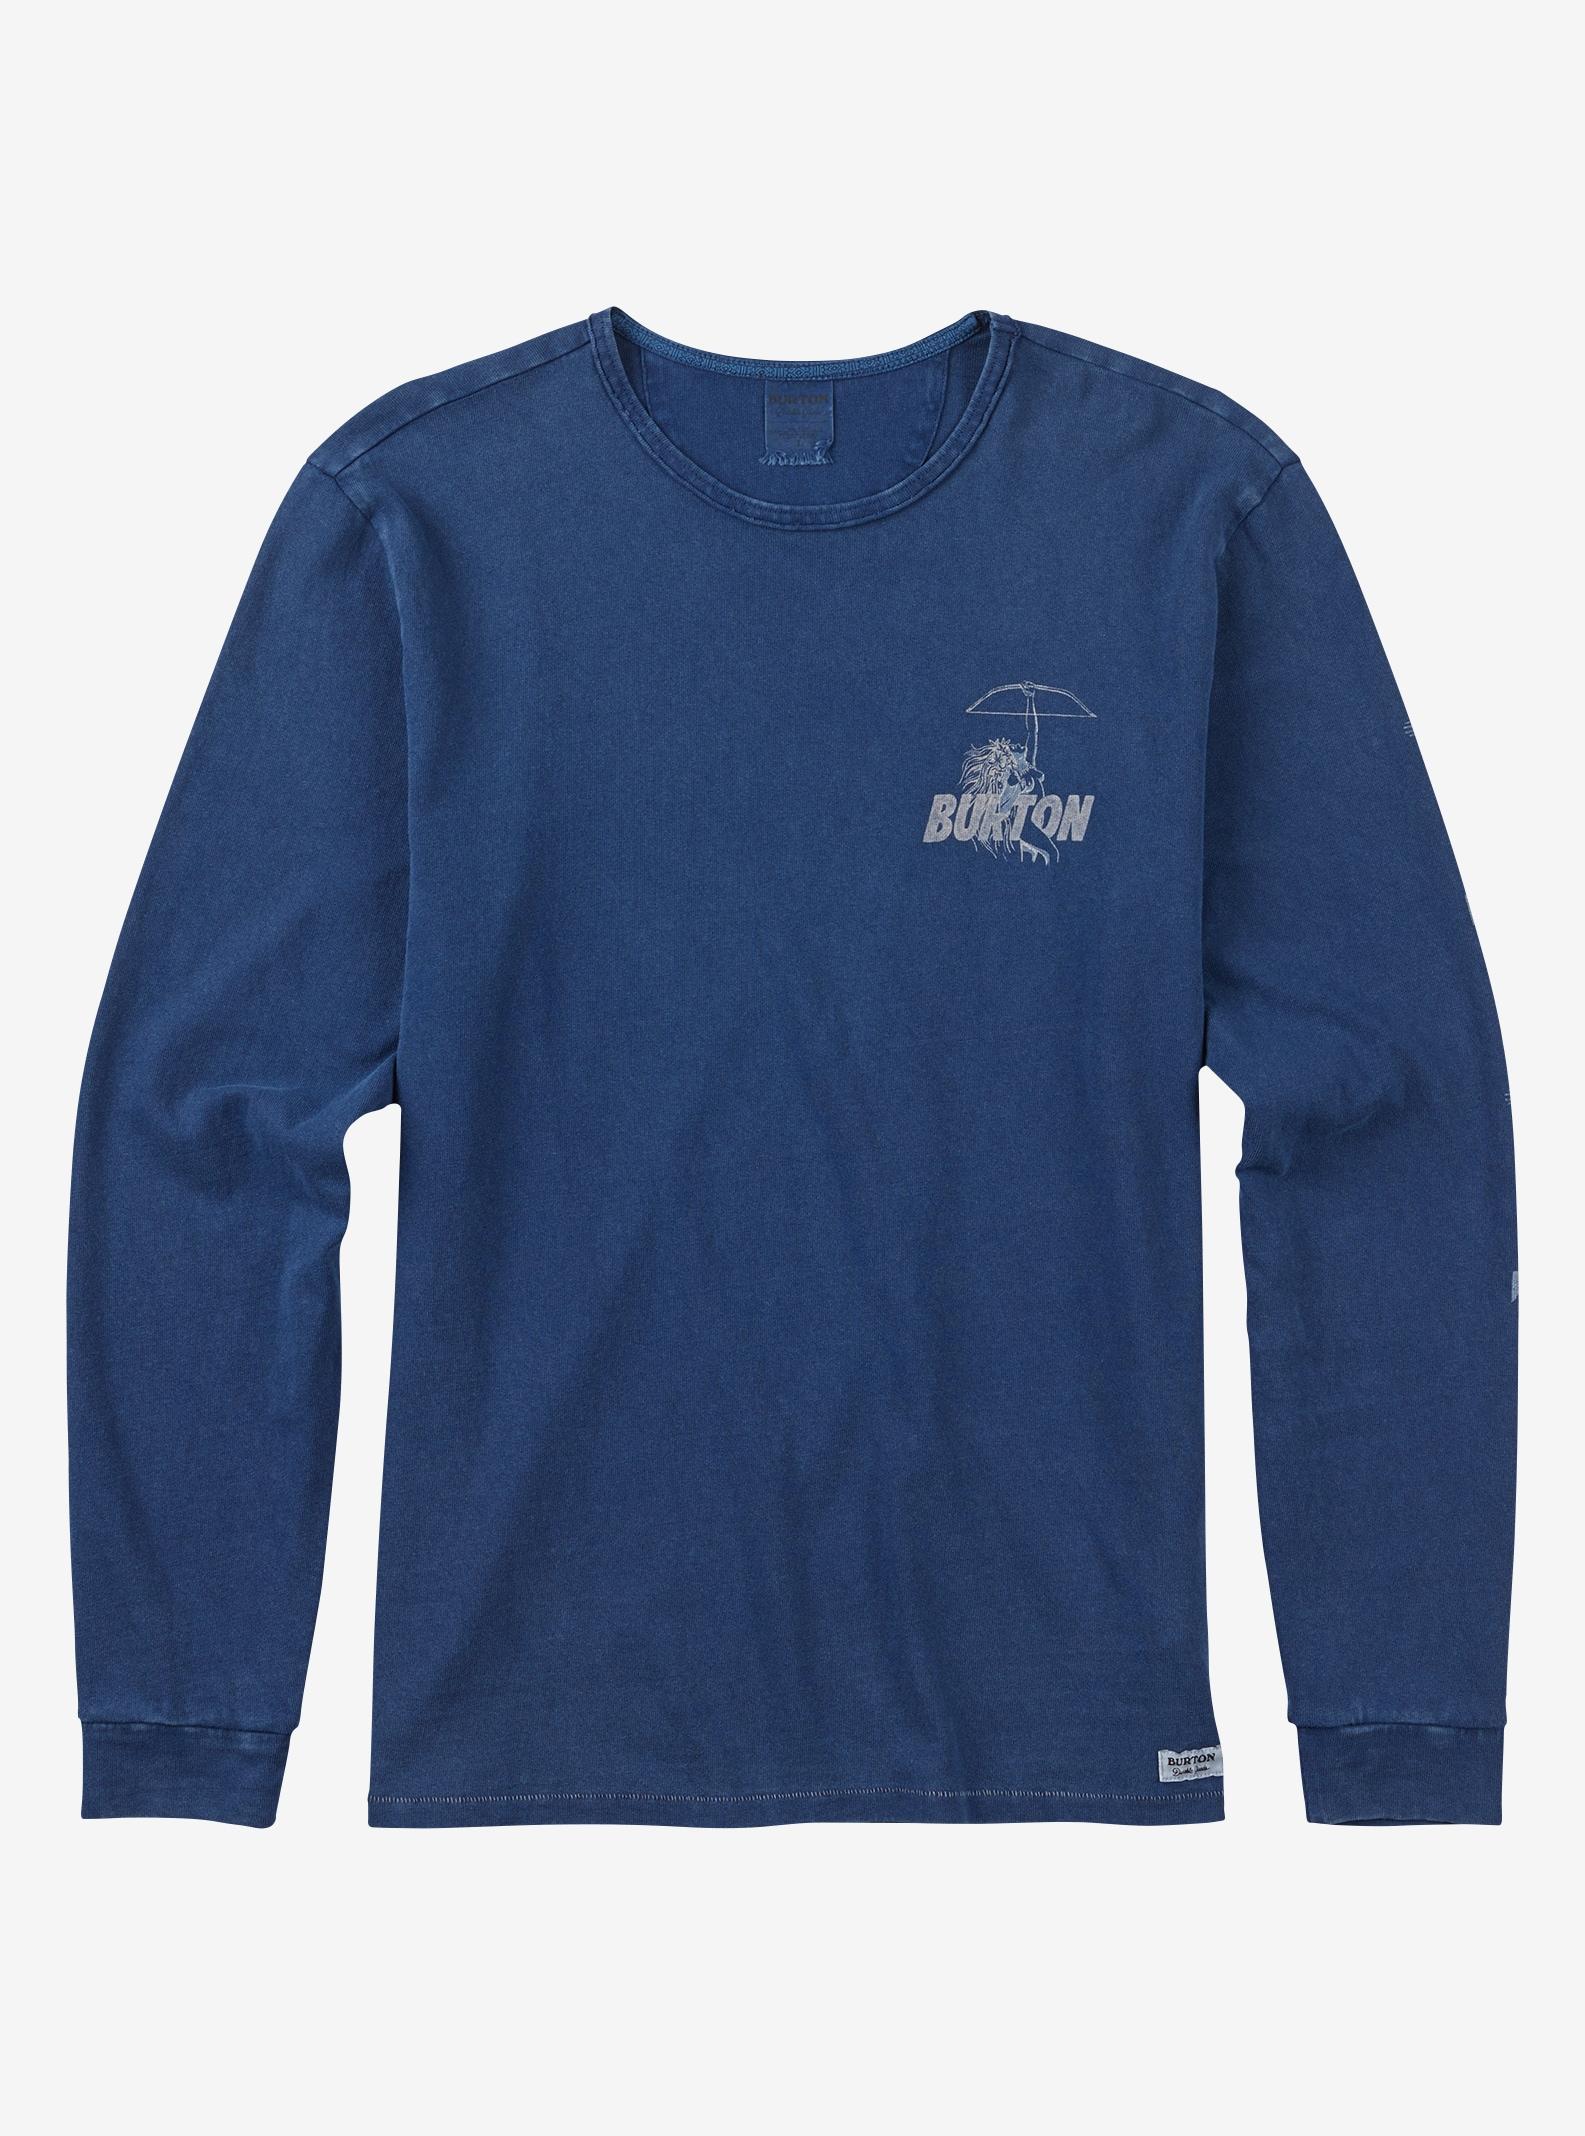 Men's Burton Walker Long Sleeve T Shirt shown in Mood Indigo